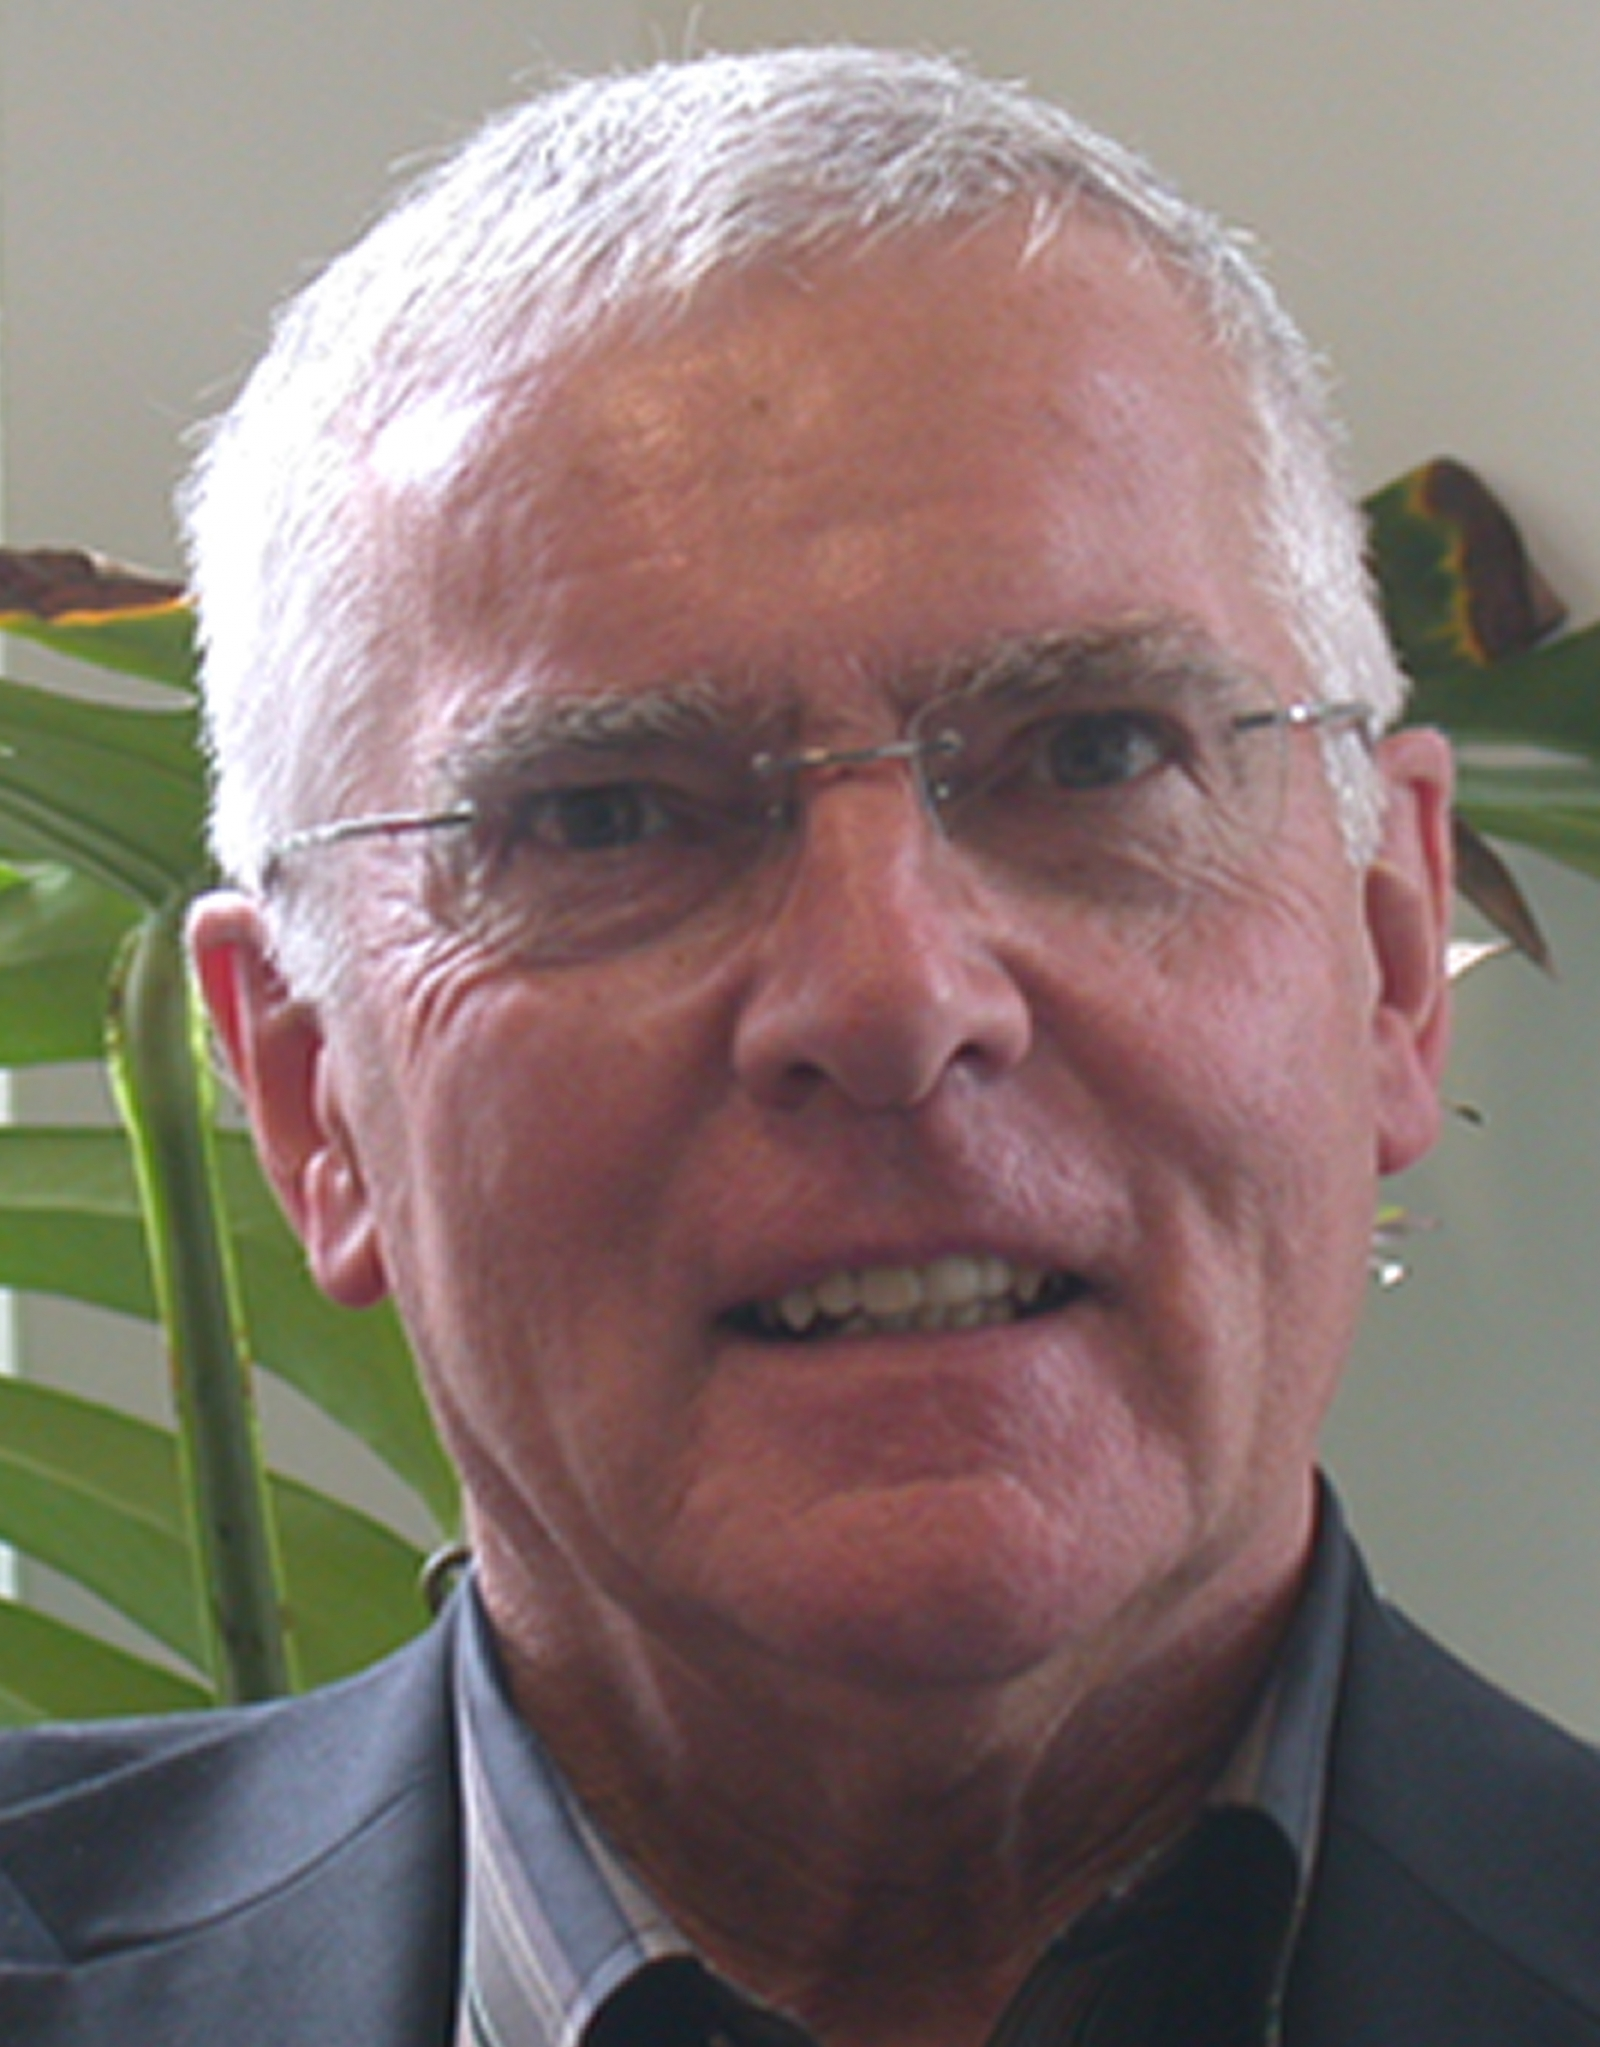 Sir David Metcalf, the UK's director of labour market enforcement